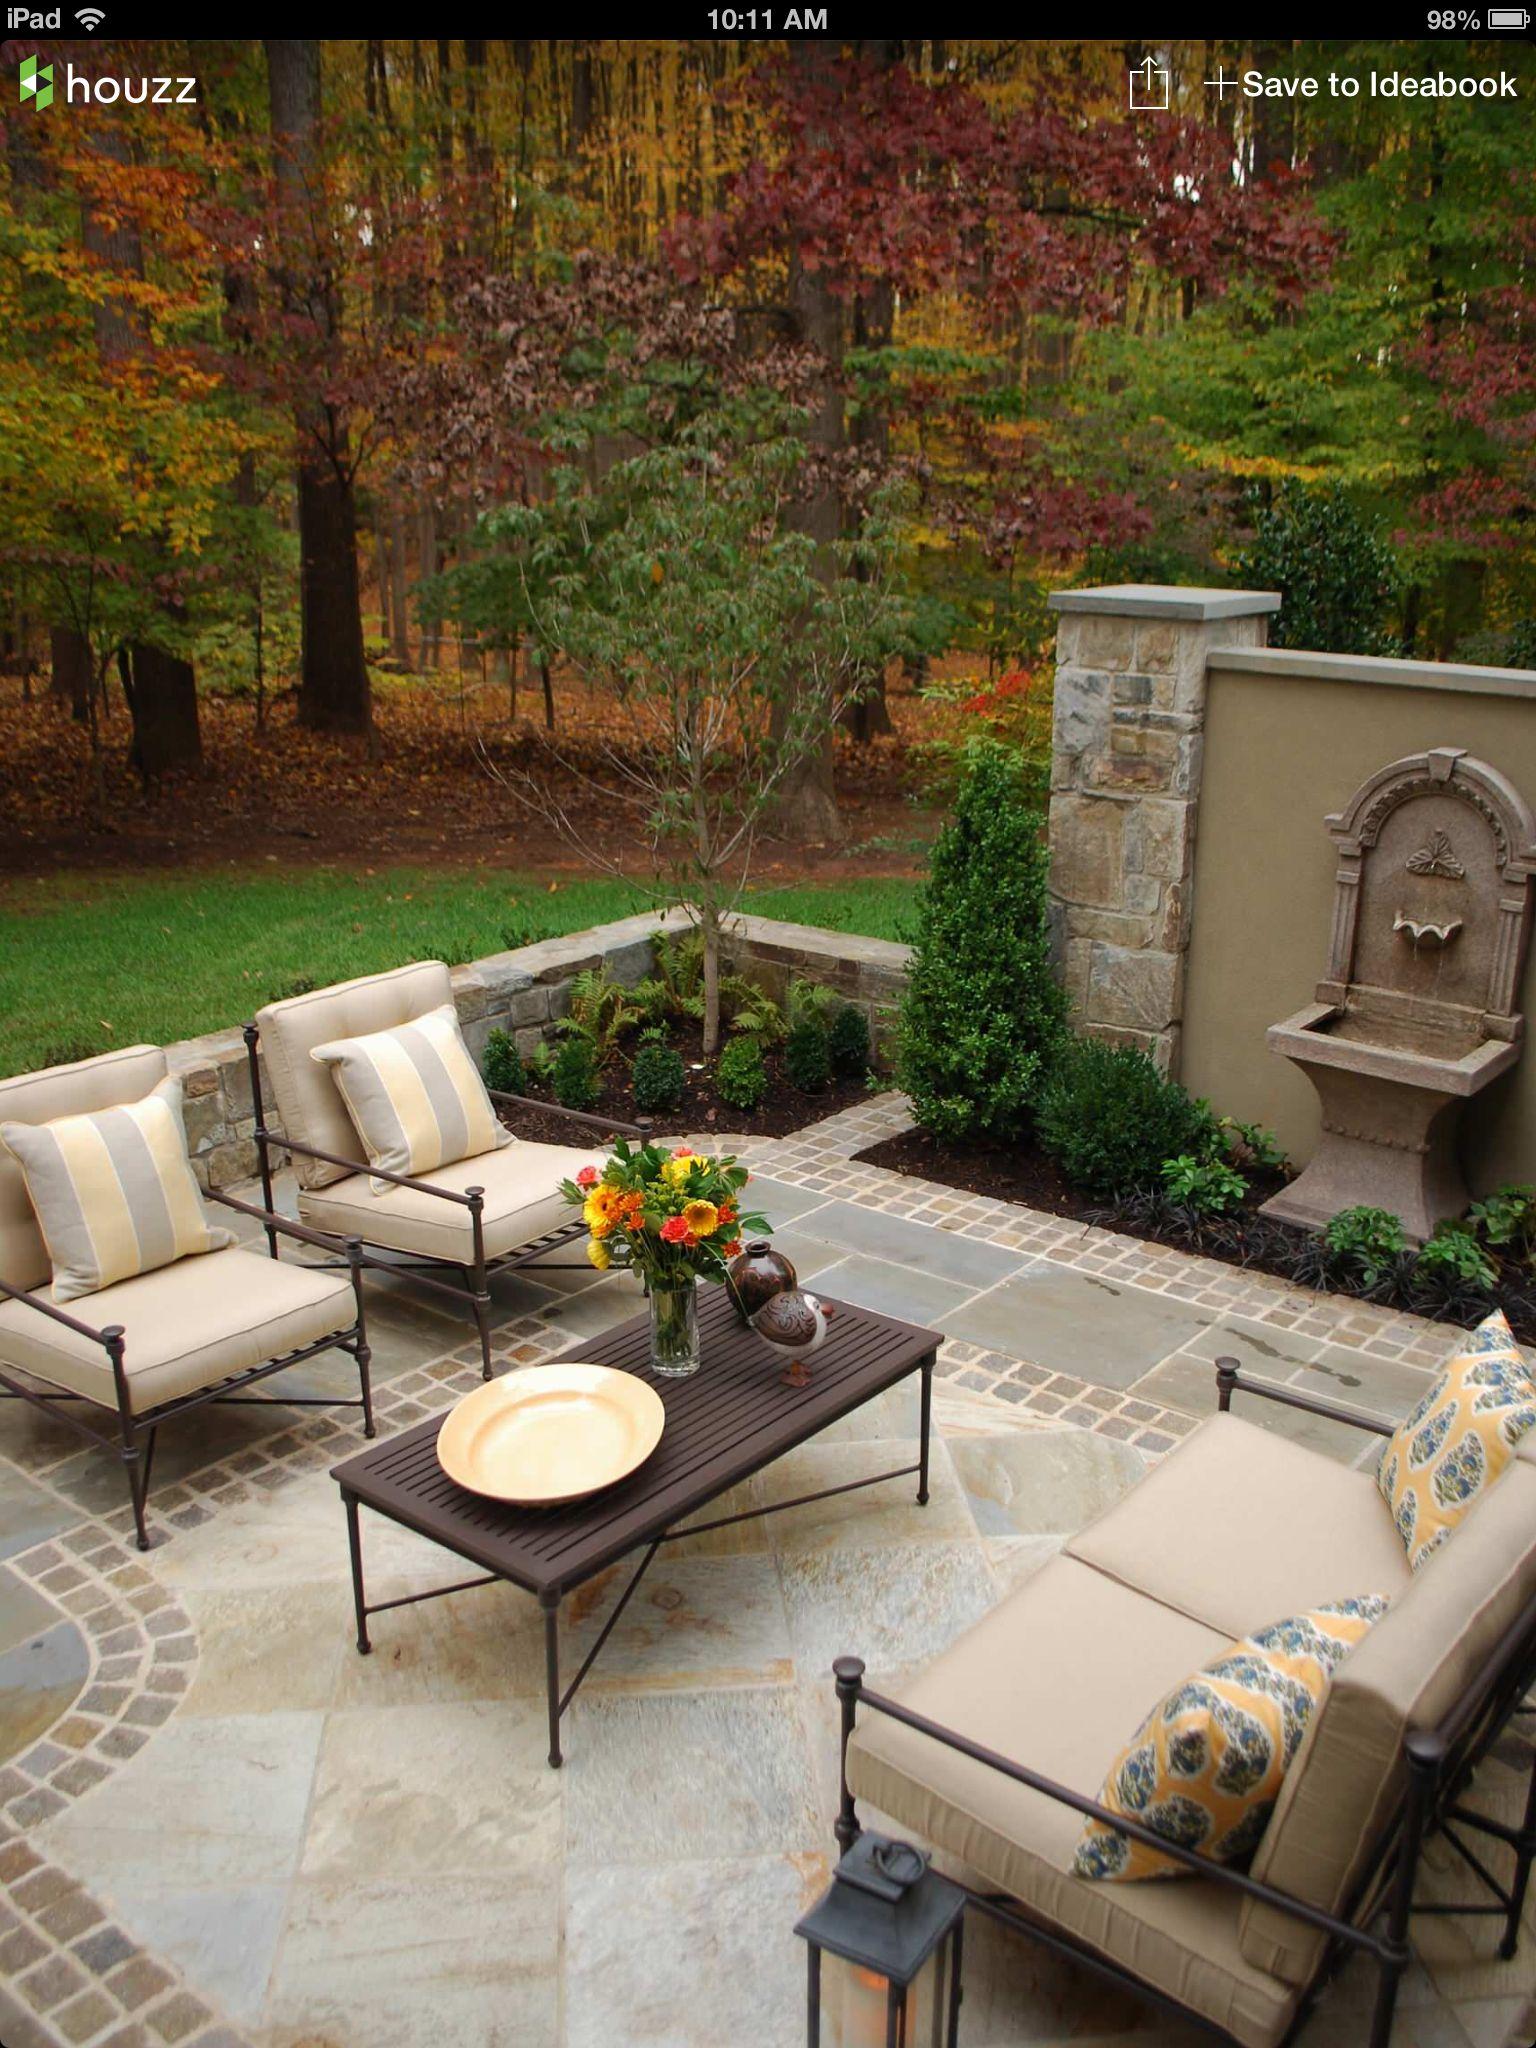 Calming aurosalas de jard n pinterest terrazas - Decoraciones de terrazas ...